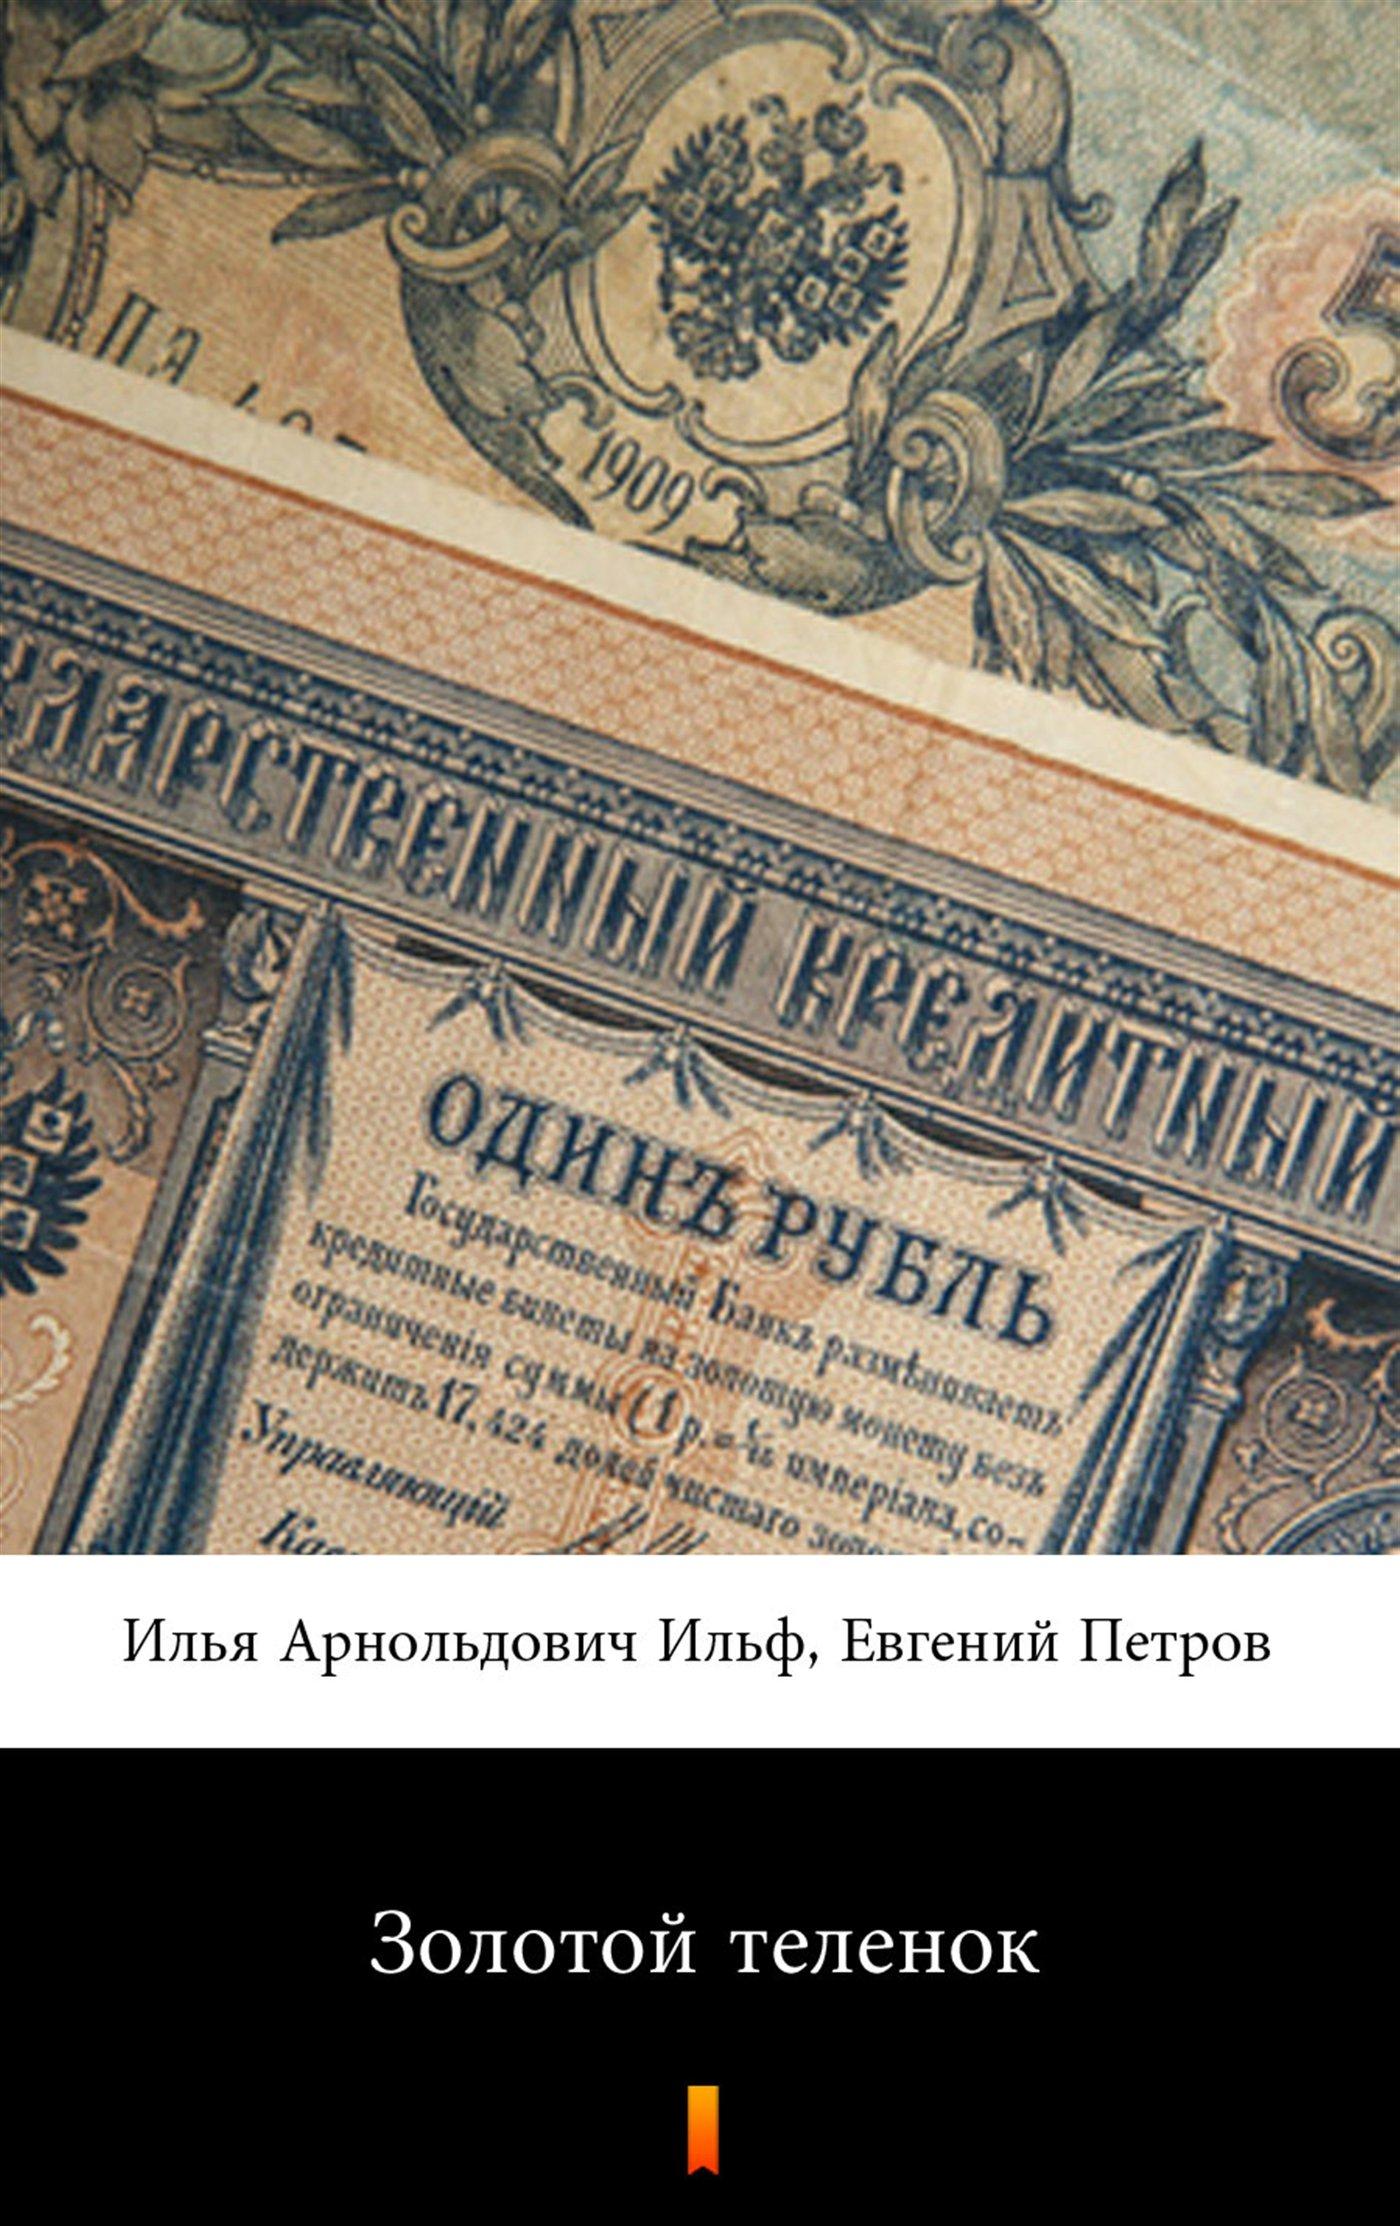 Золотой теленок - Ebook (Książka EPUB) do pobrania w formacie EPUB